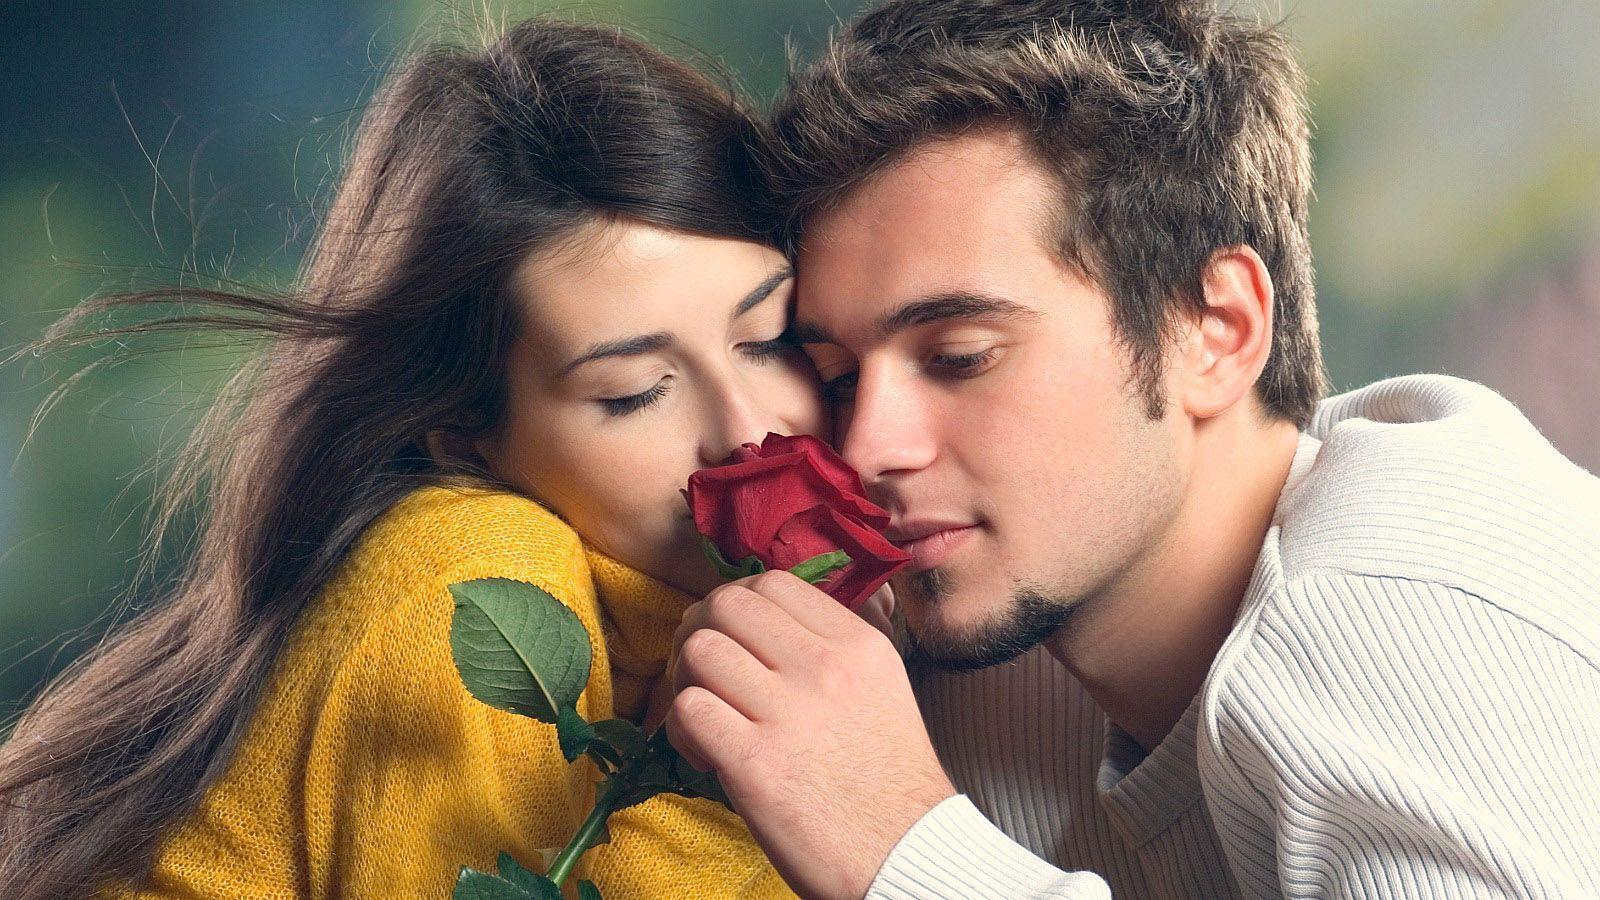 Romantic Wallpaper Hd Download